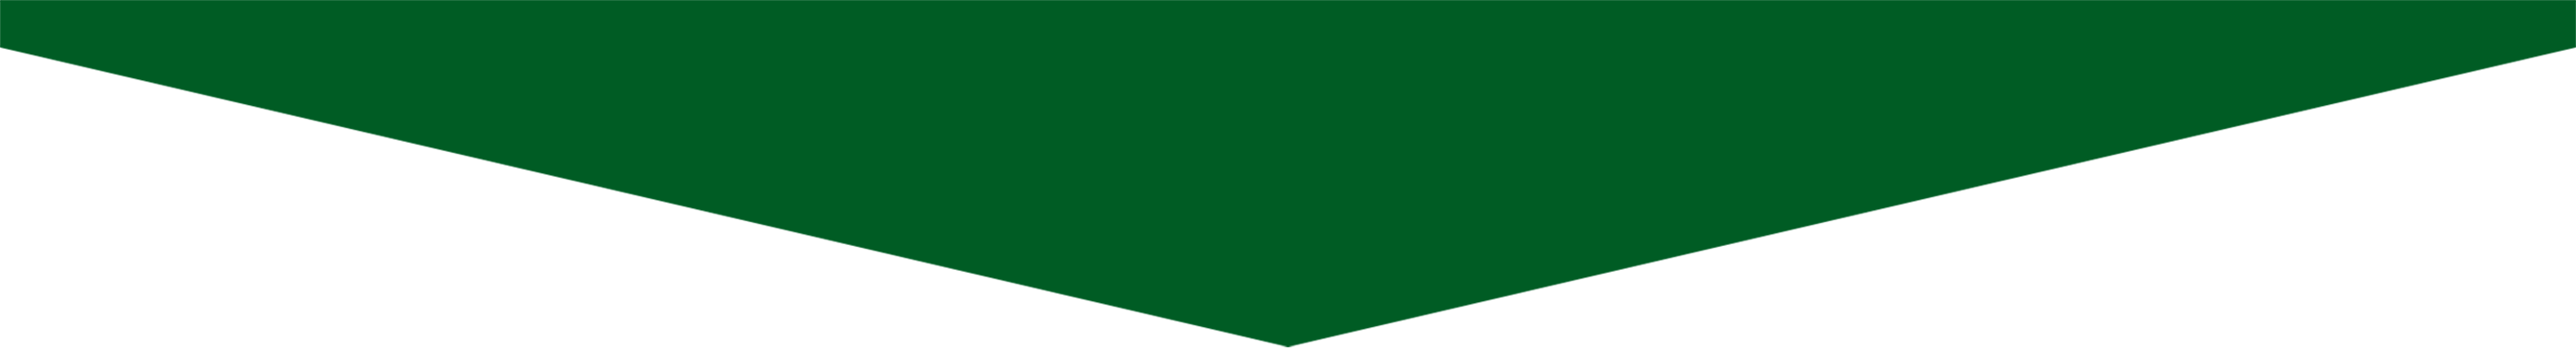 franja_verde4